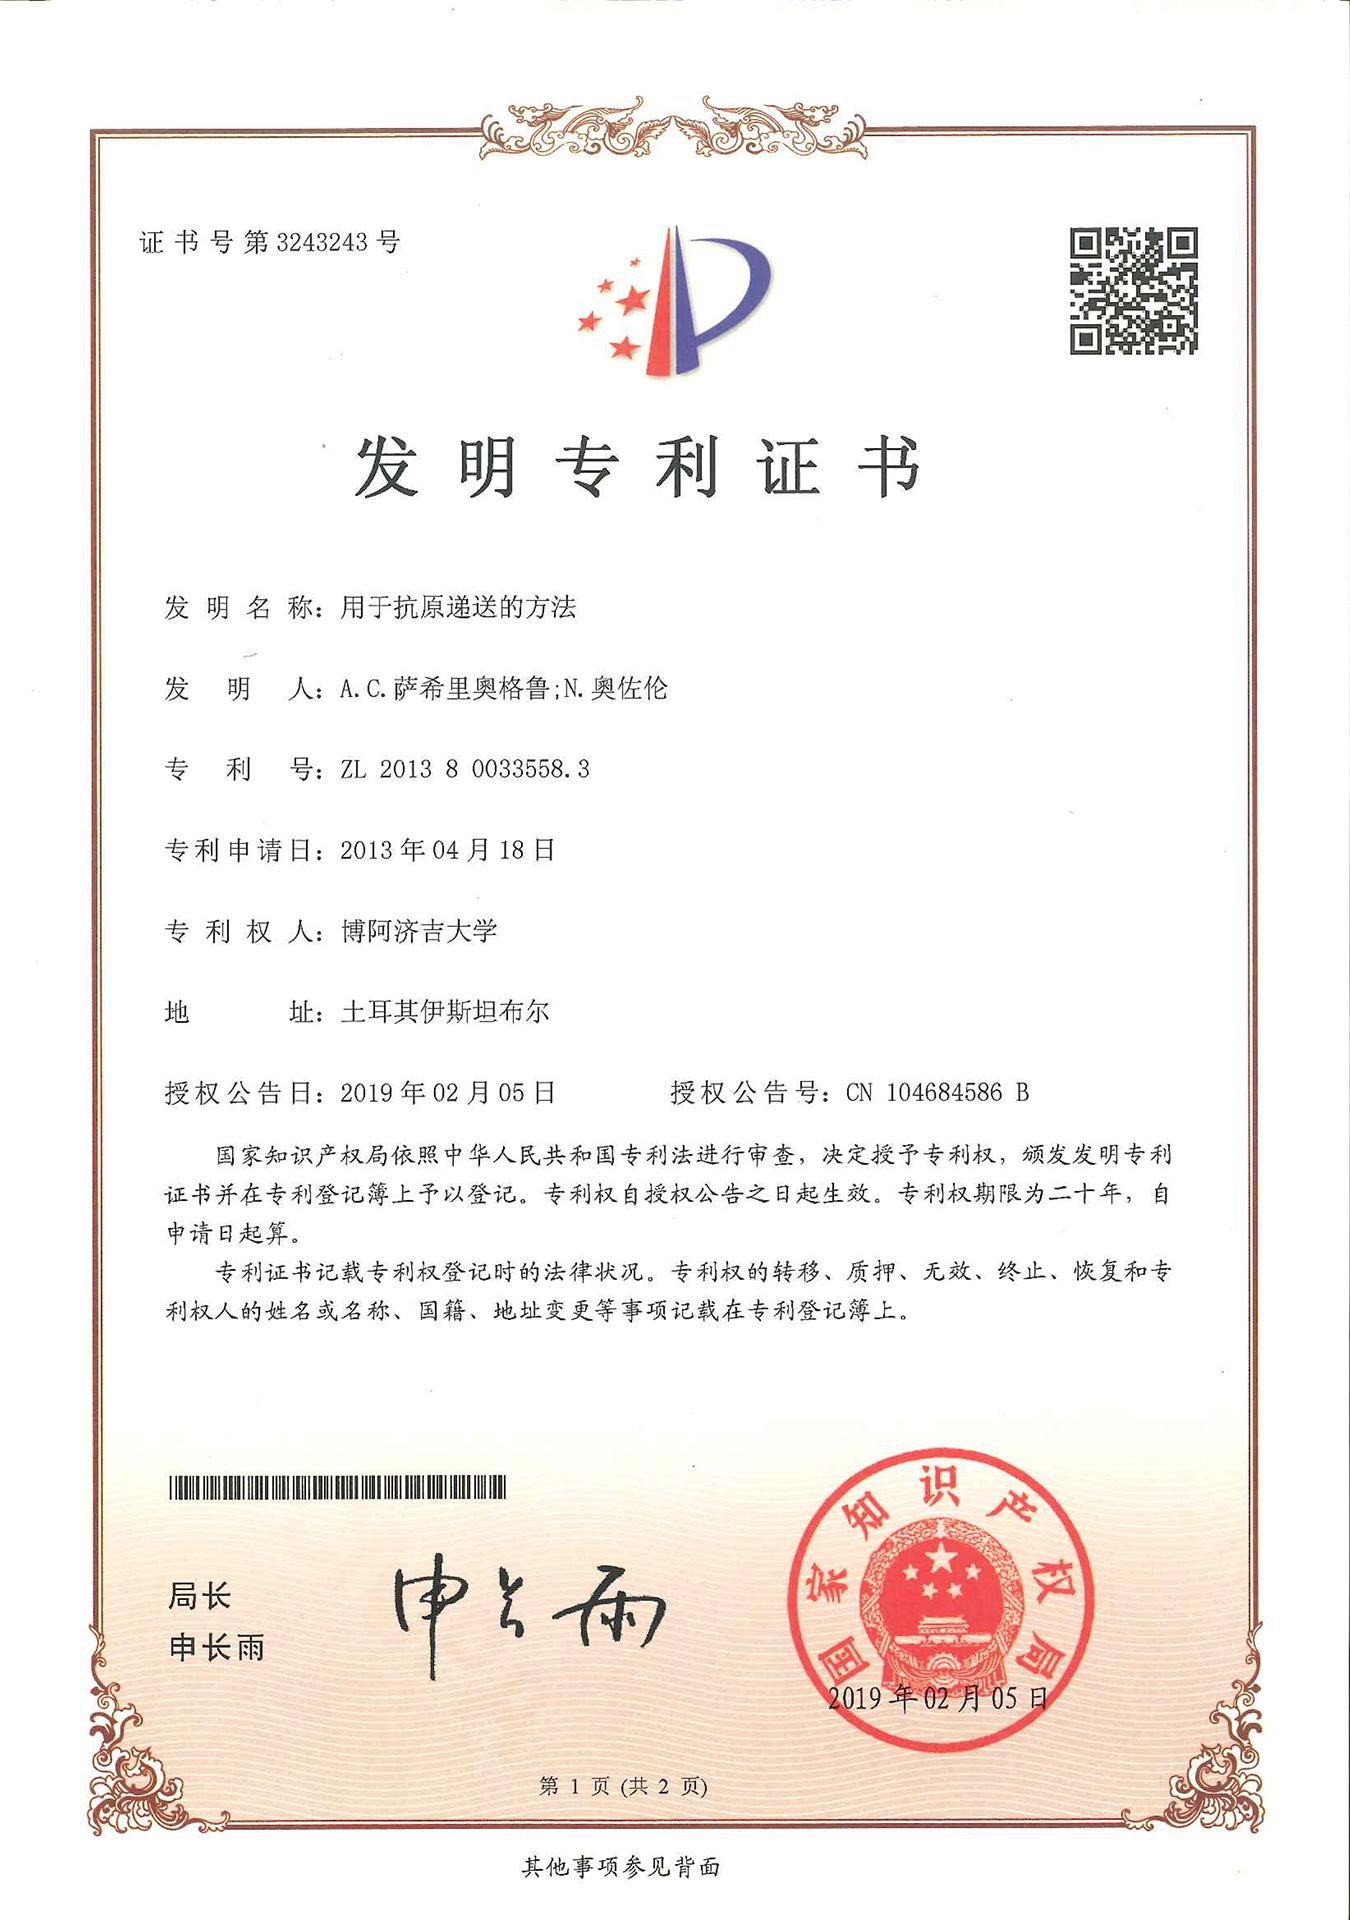 https://vaccizone.com/wp-content/uploads/2021/02/ÇinPatent-1.jpg